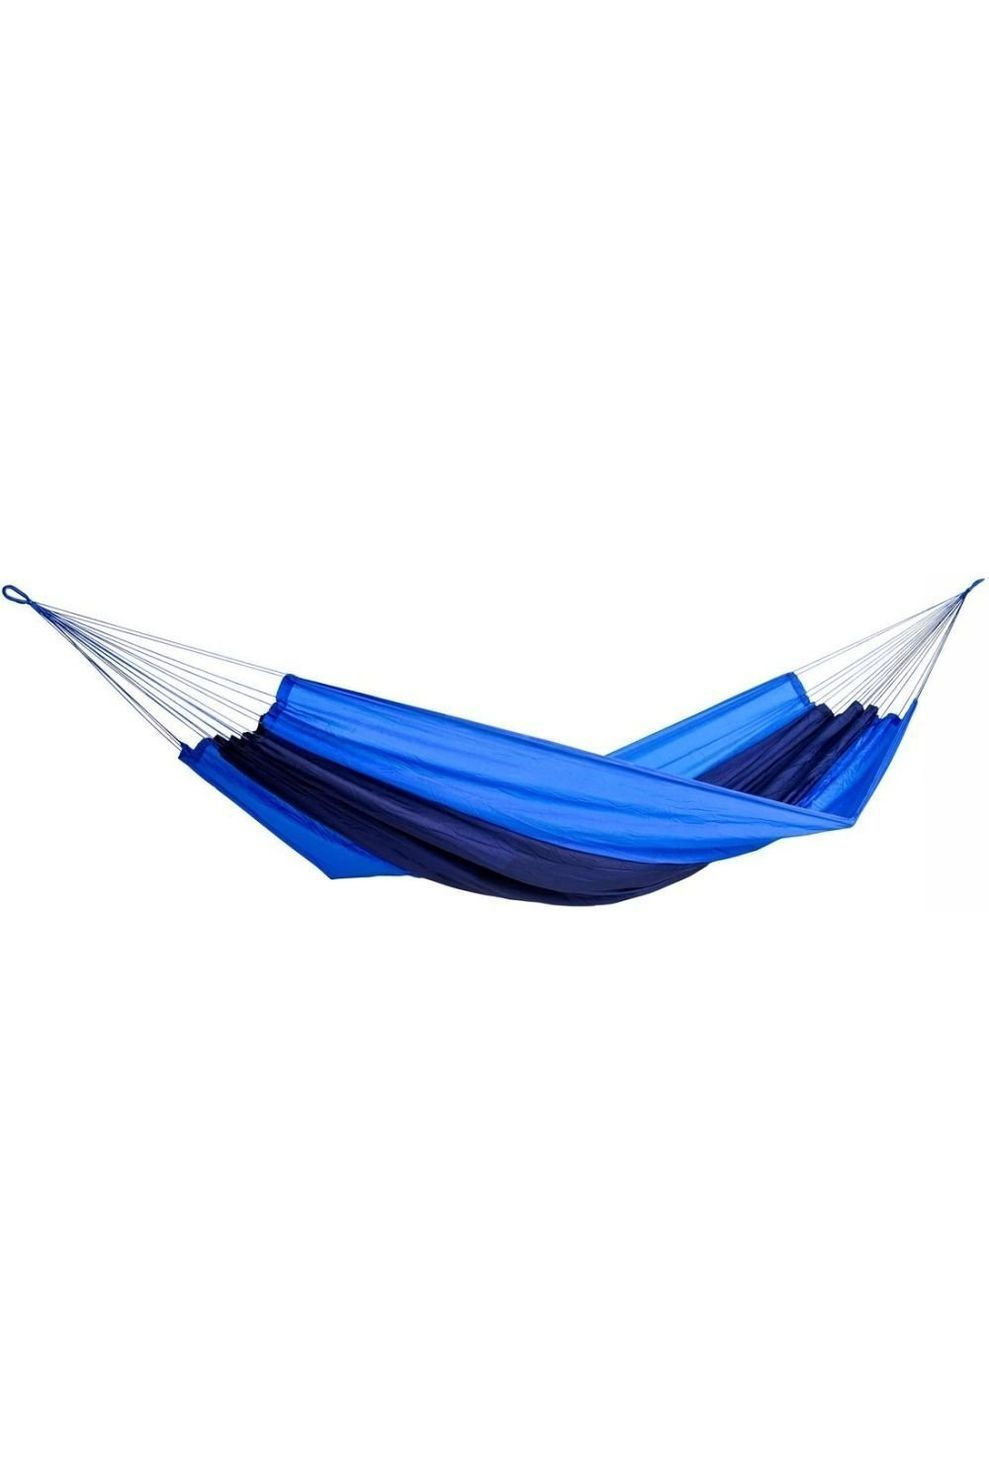 Amazonas Hangmat Silk Traveller - Blauw